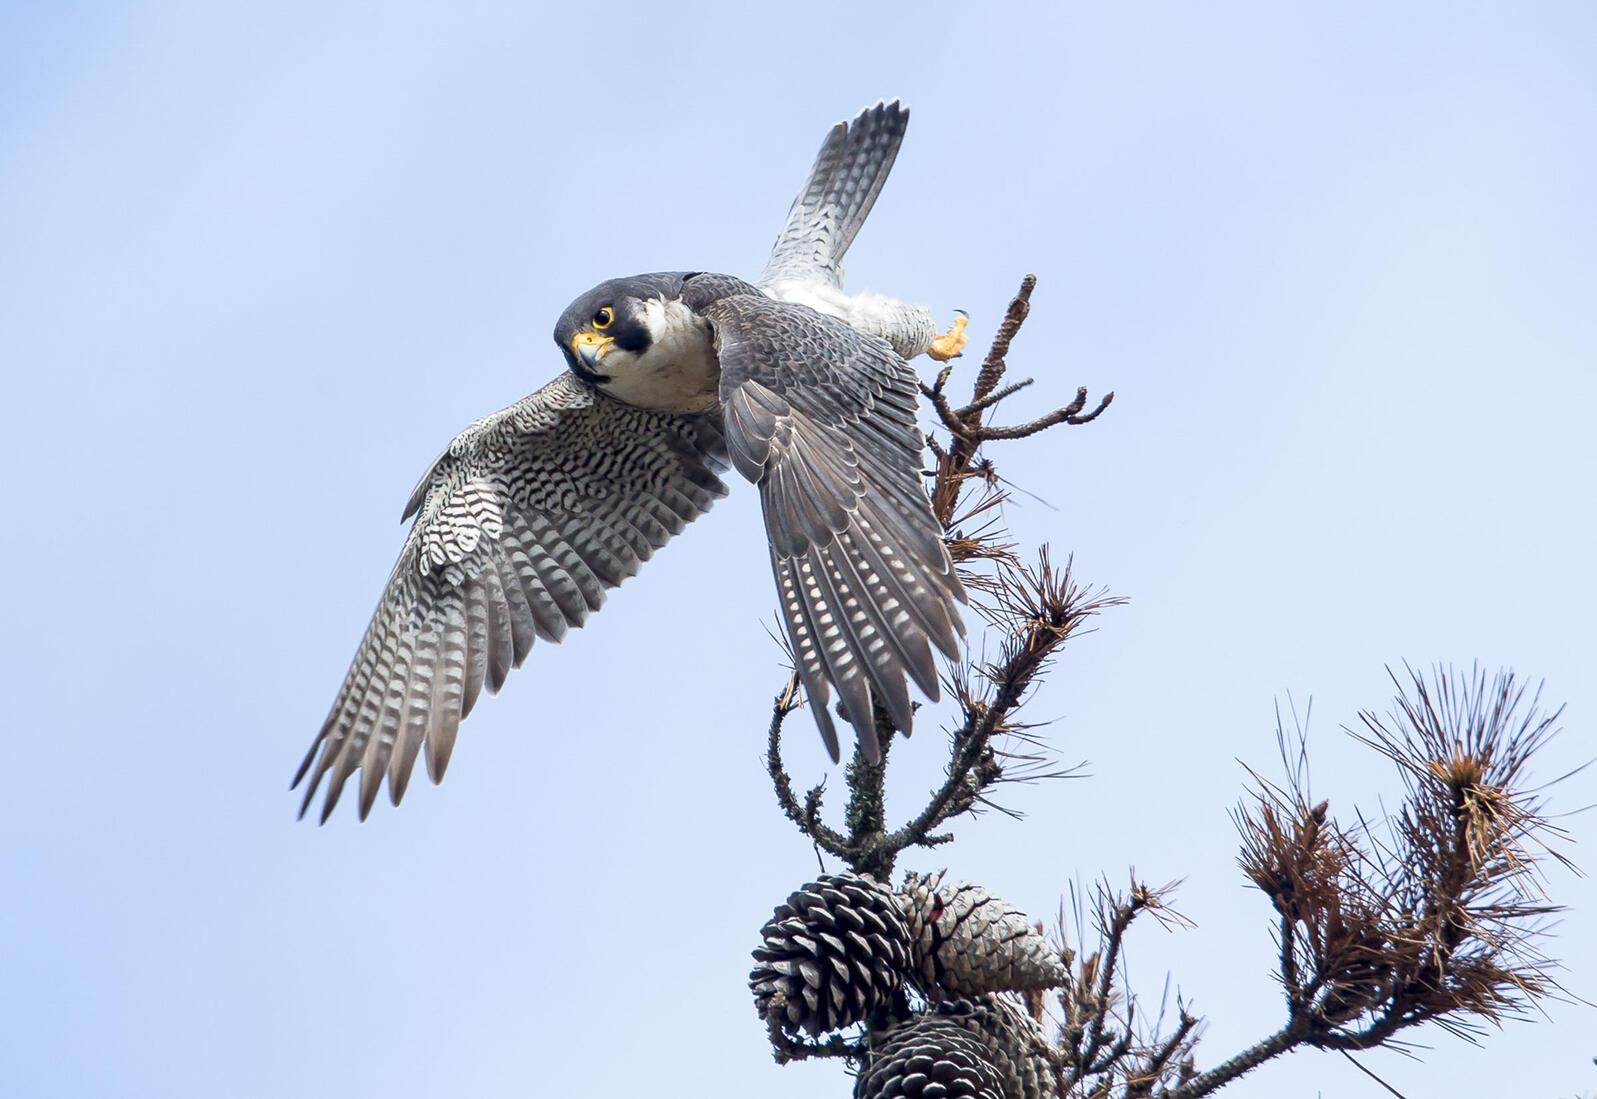 Peregrine Falcon. Richard Derevan/Audubon Photography Awards